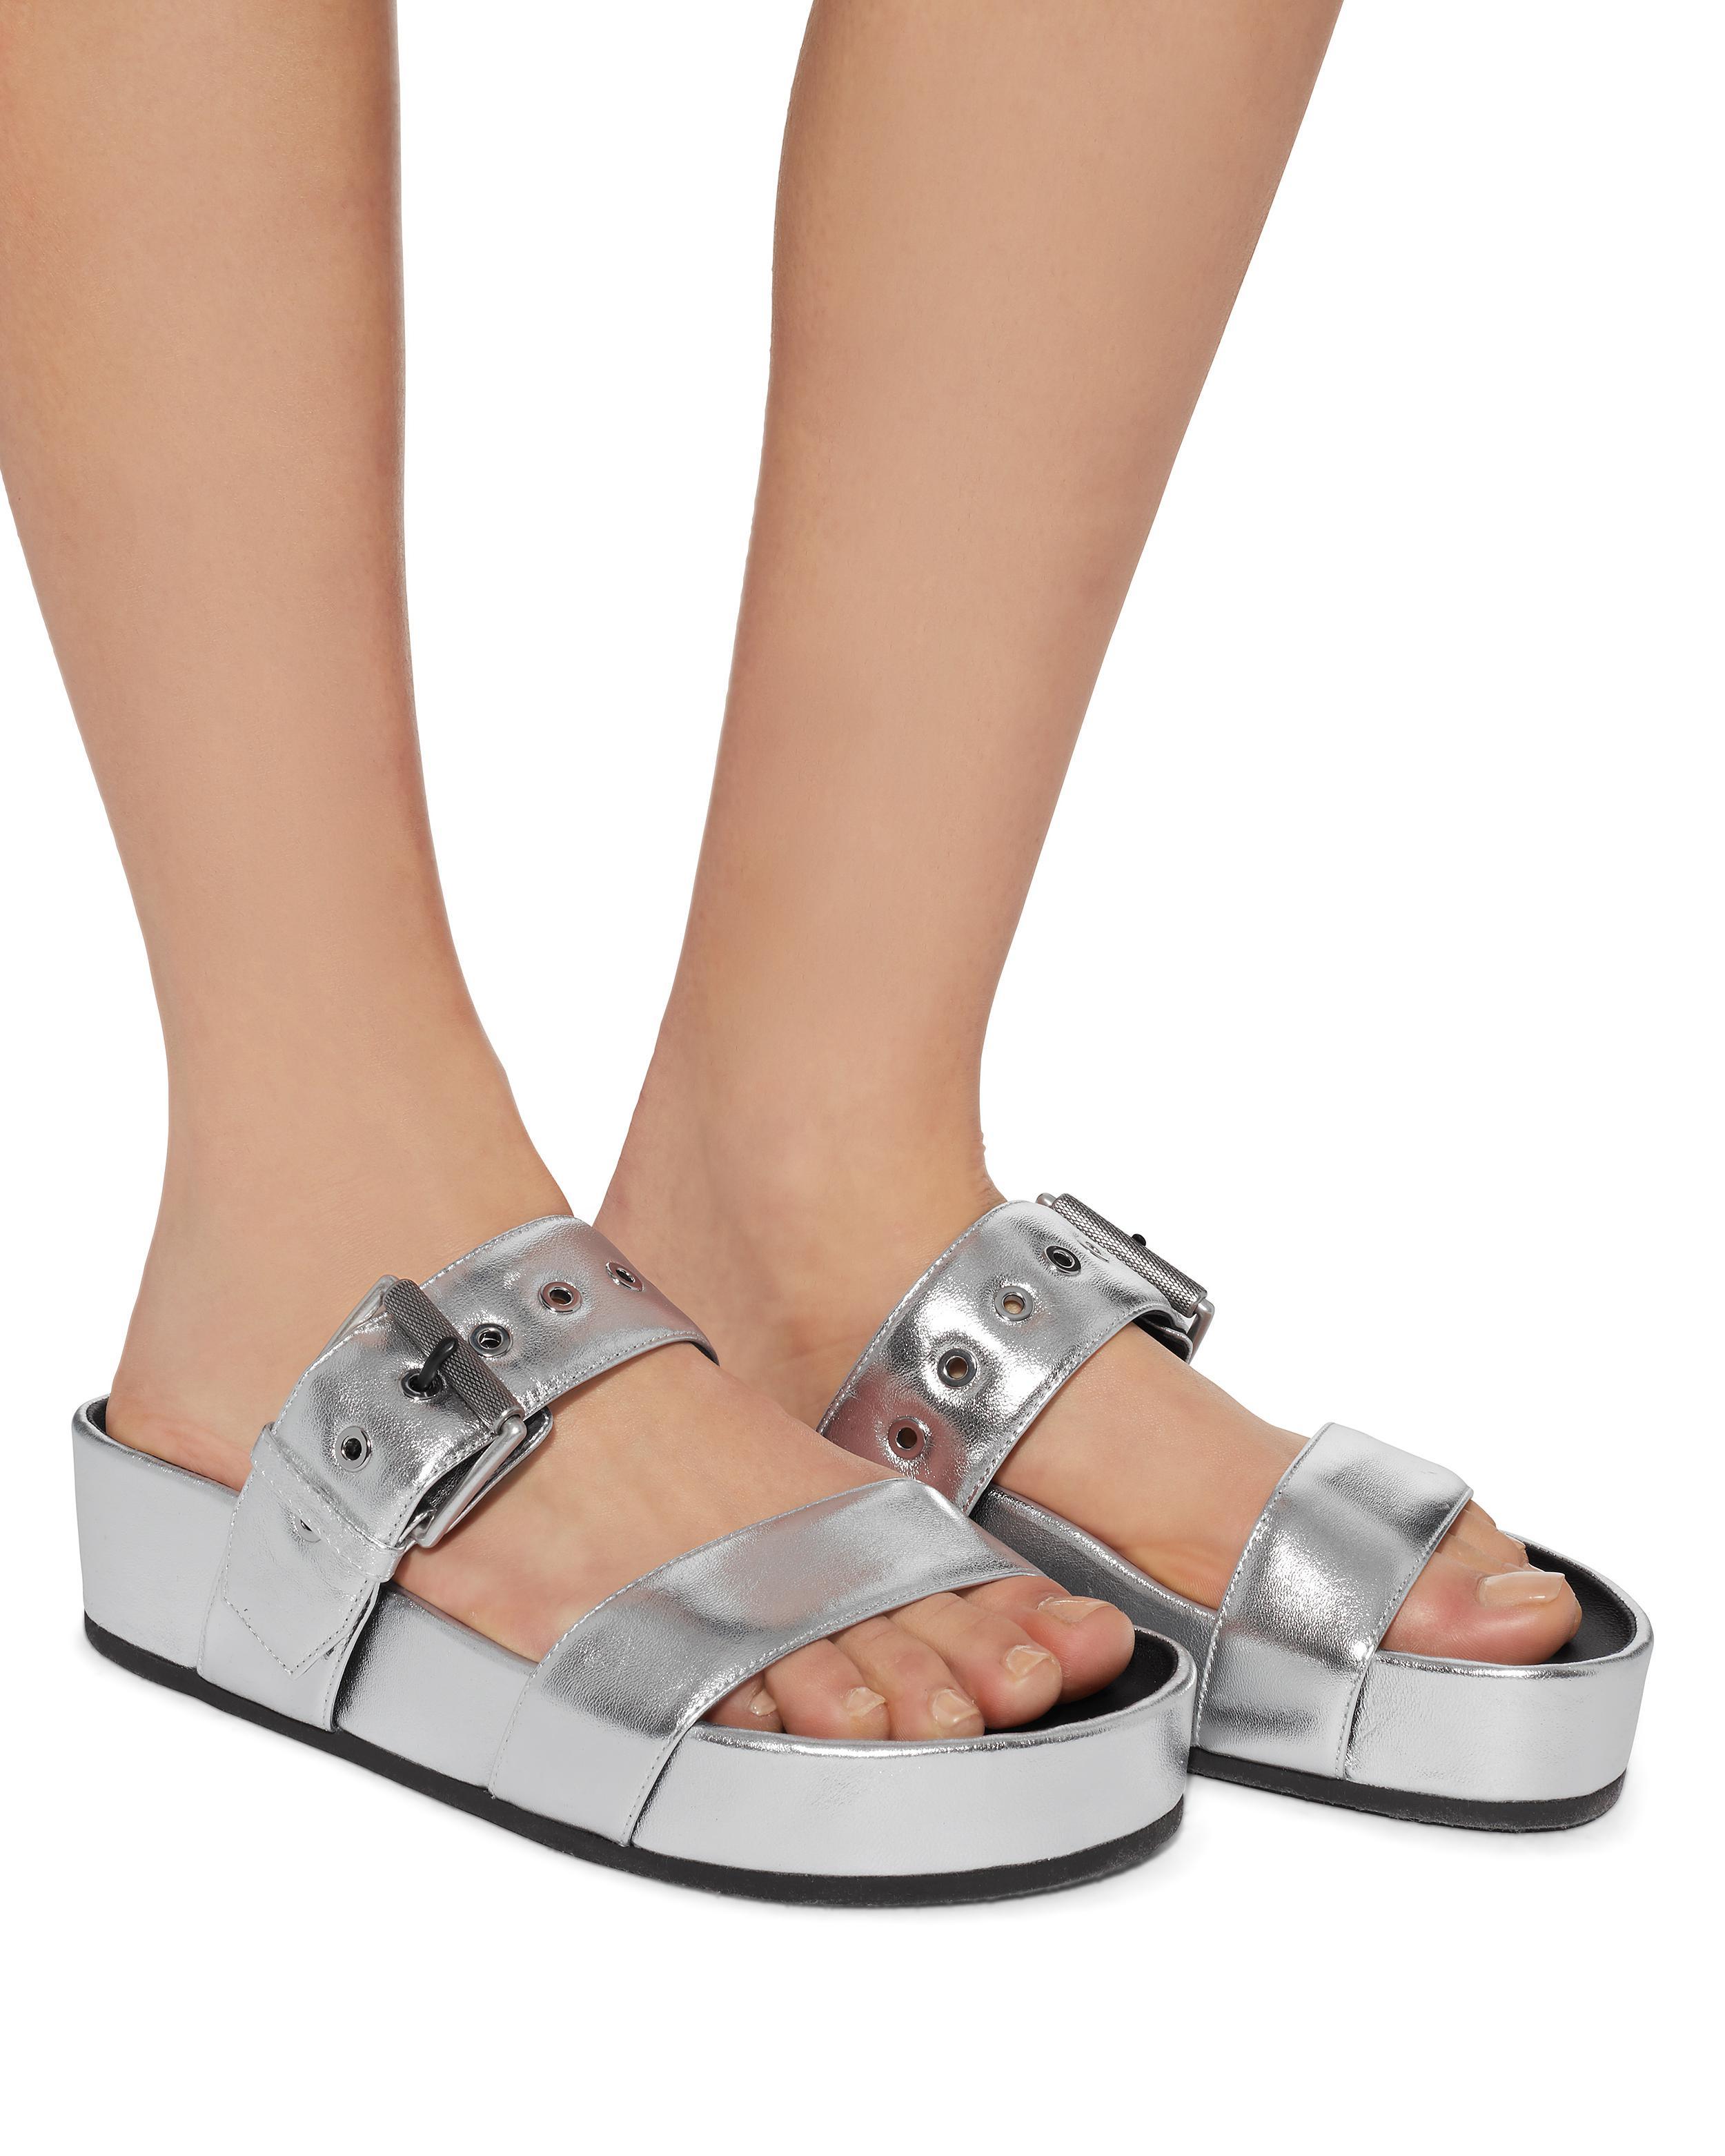 cf66188a3524 Lyst - Rag   Bone Evin Silver Leather Platform Sandals in Metallic